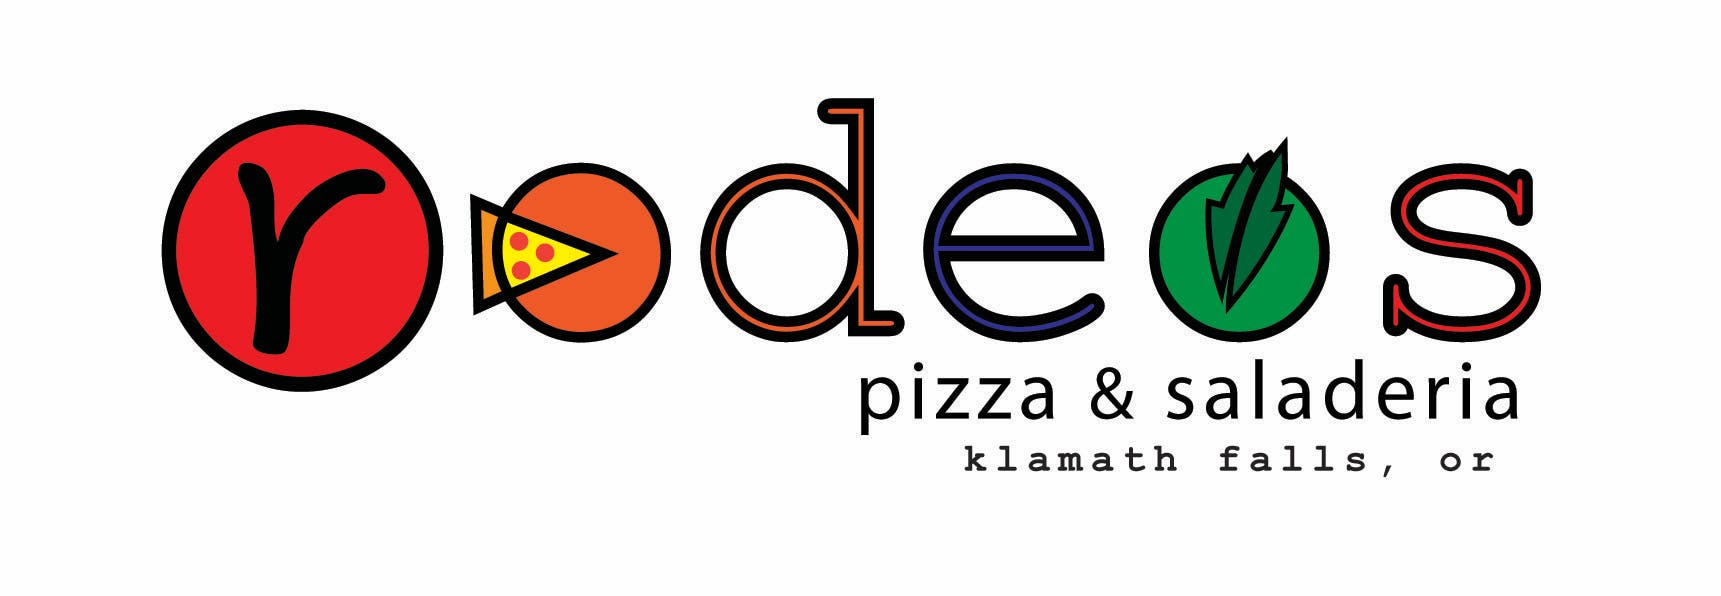 fb4842d422ade Rodeos Pizza   Saladeria Logo